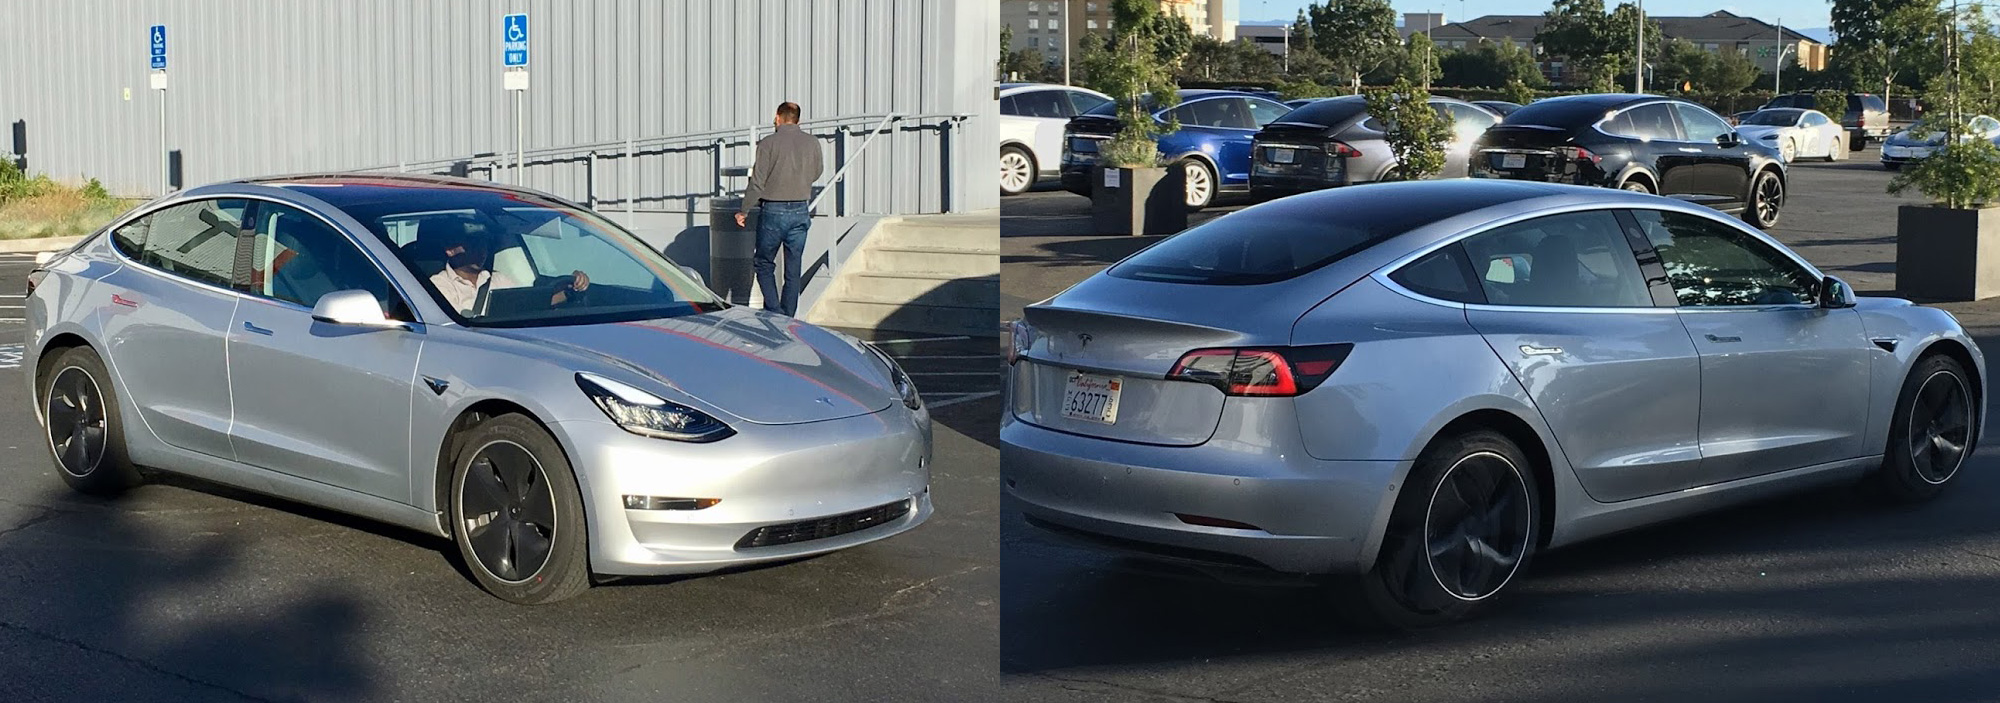 Цвета Midnight Silver Metallic и Silver Metallic Tesla Model 3